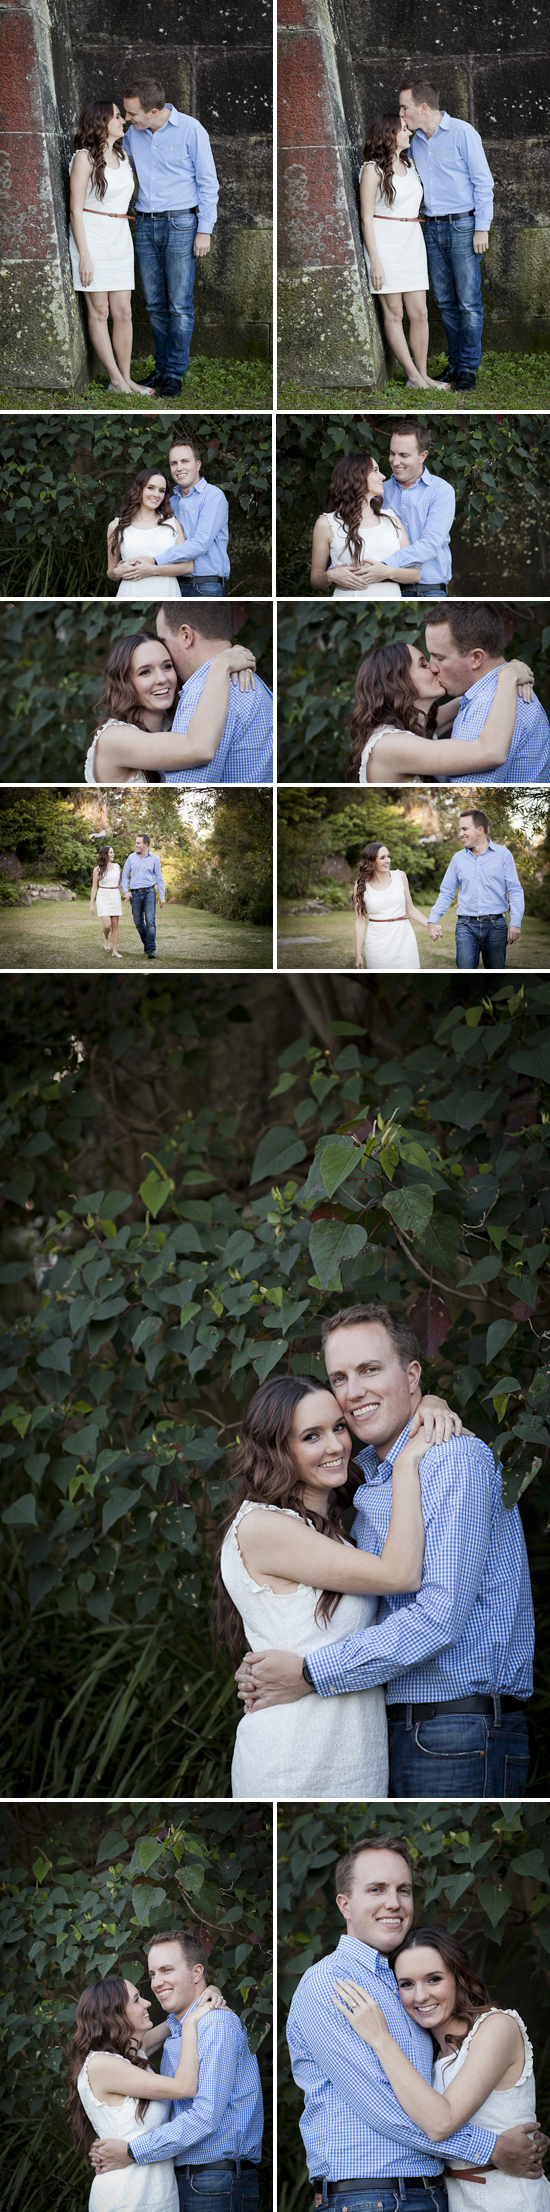 Hayley & Matt's Engagement Photos | Gunner Barracks Sydney